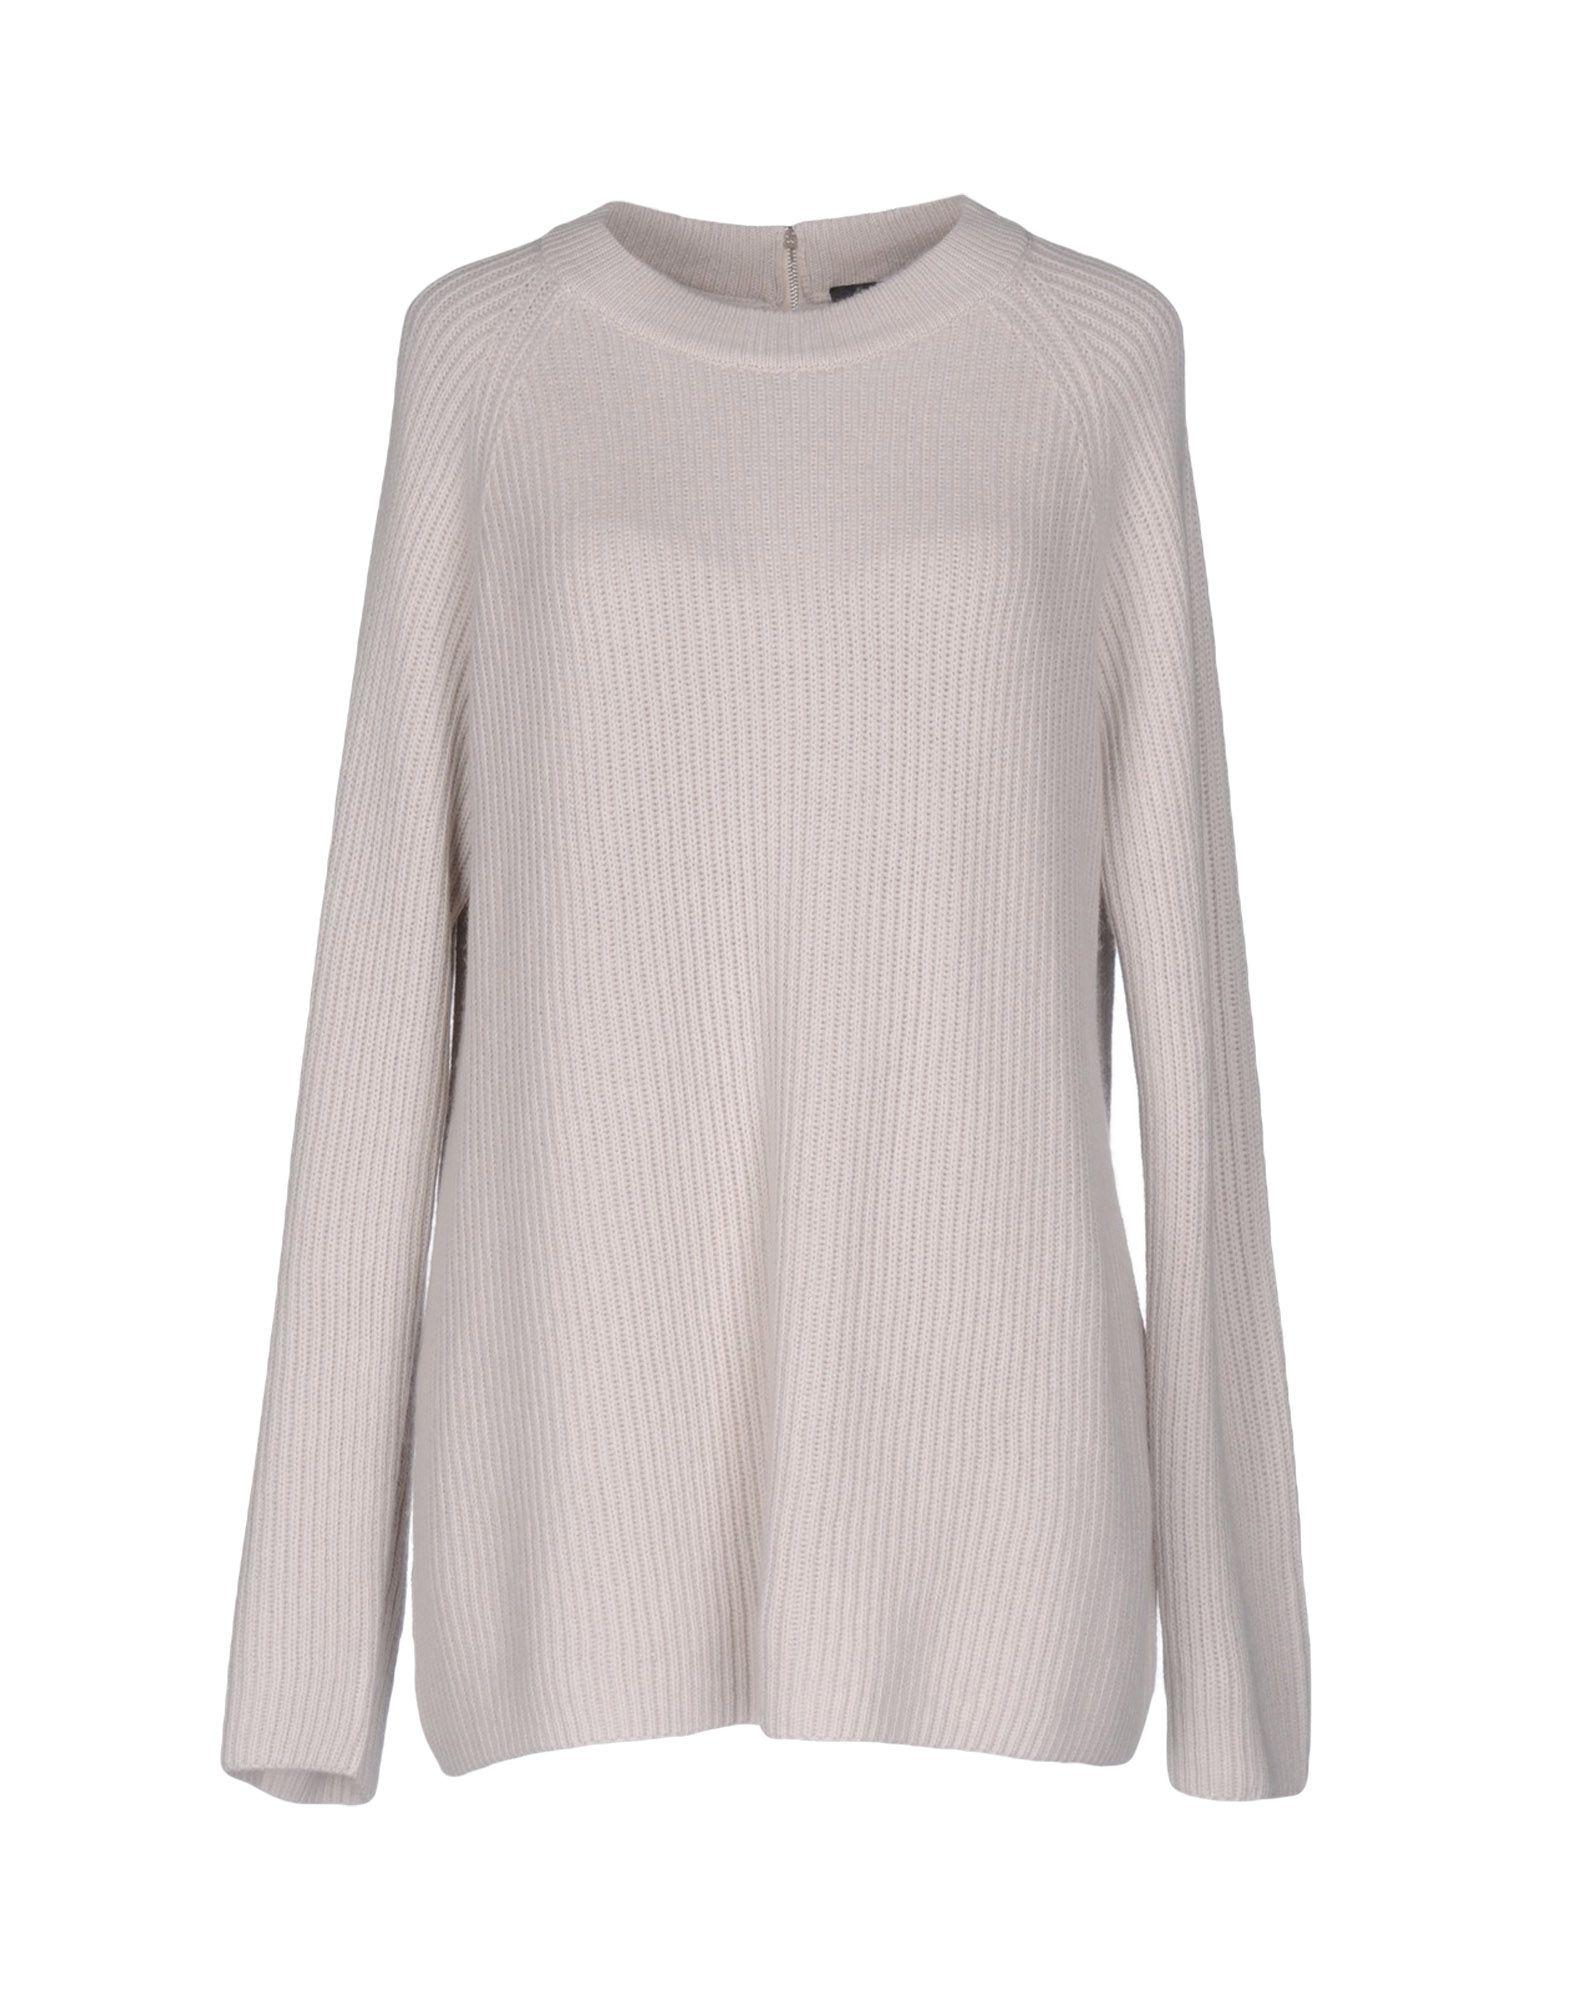 TORTONA 21 Damen Pullover Farbe Hellgrau Größe 7 - broschei